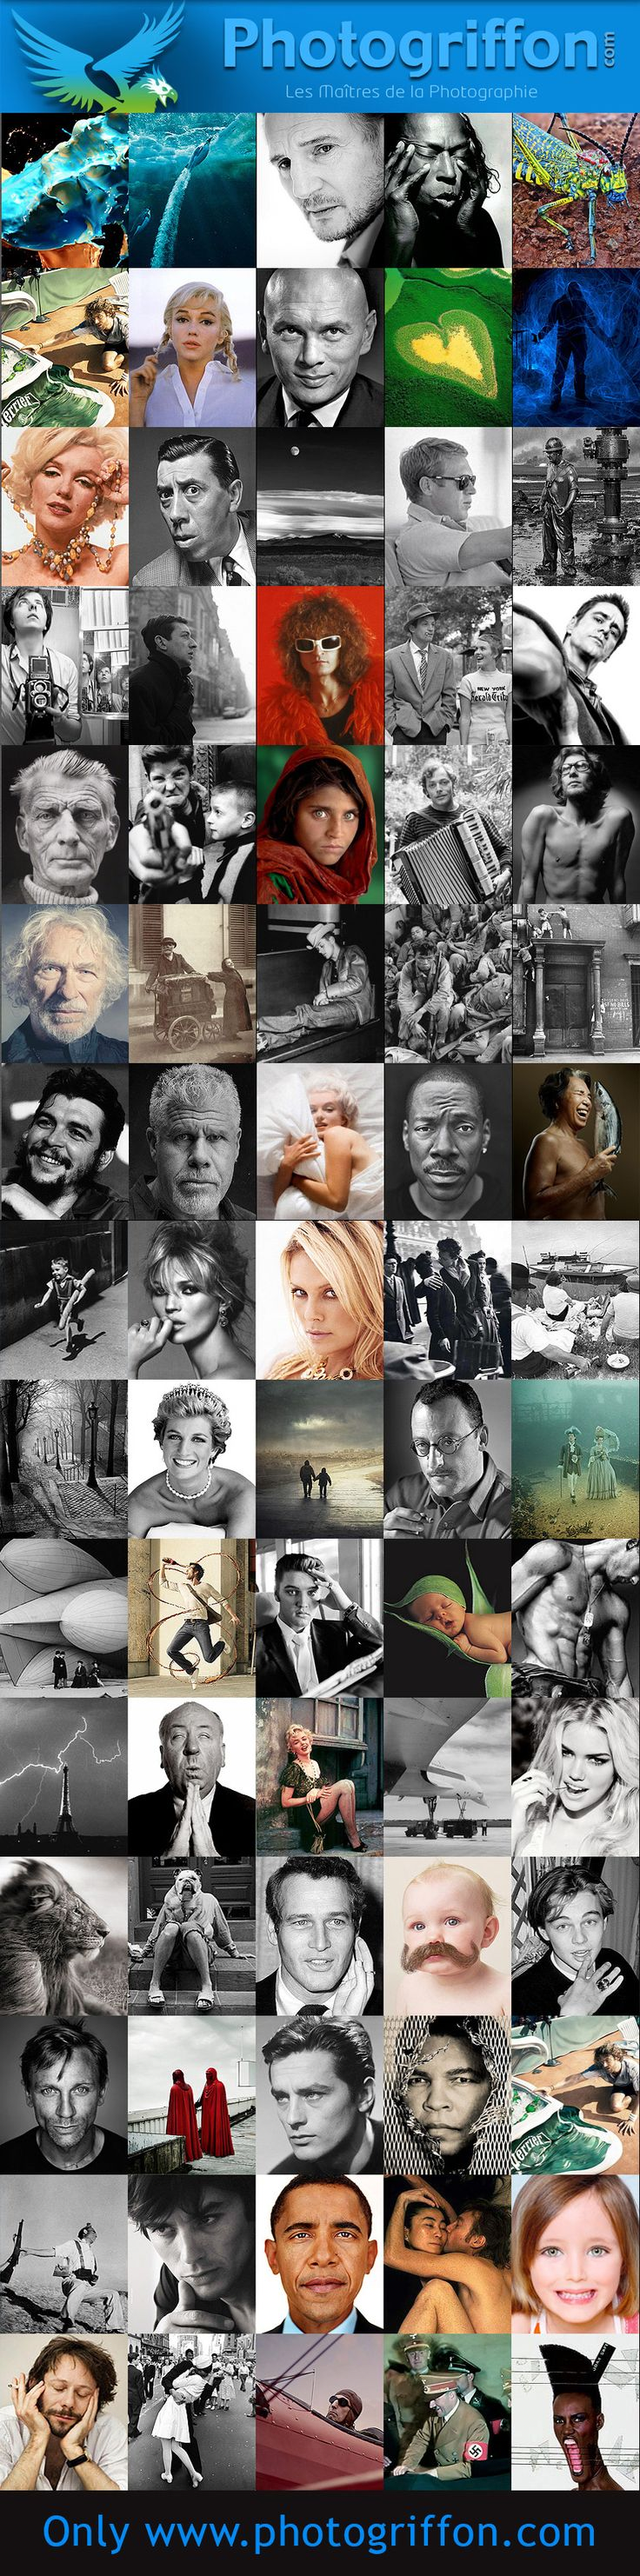 Master of photographer Willy Ronis, Henri-Cartier Bresson, Alfred Wertheimer, Herb Ritts, Jean Dieuzaide, Martin Schoeller, Eugene Atget, Jane Brown, Jean-Paul Goude, John Dominis.......